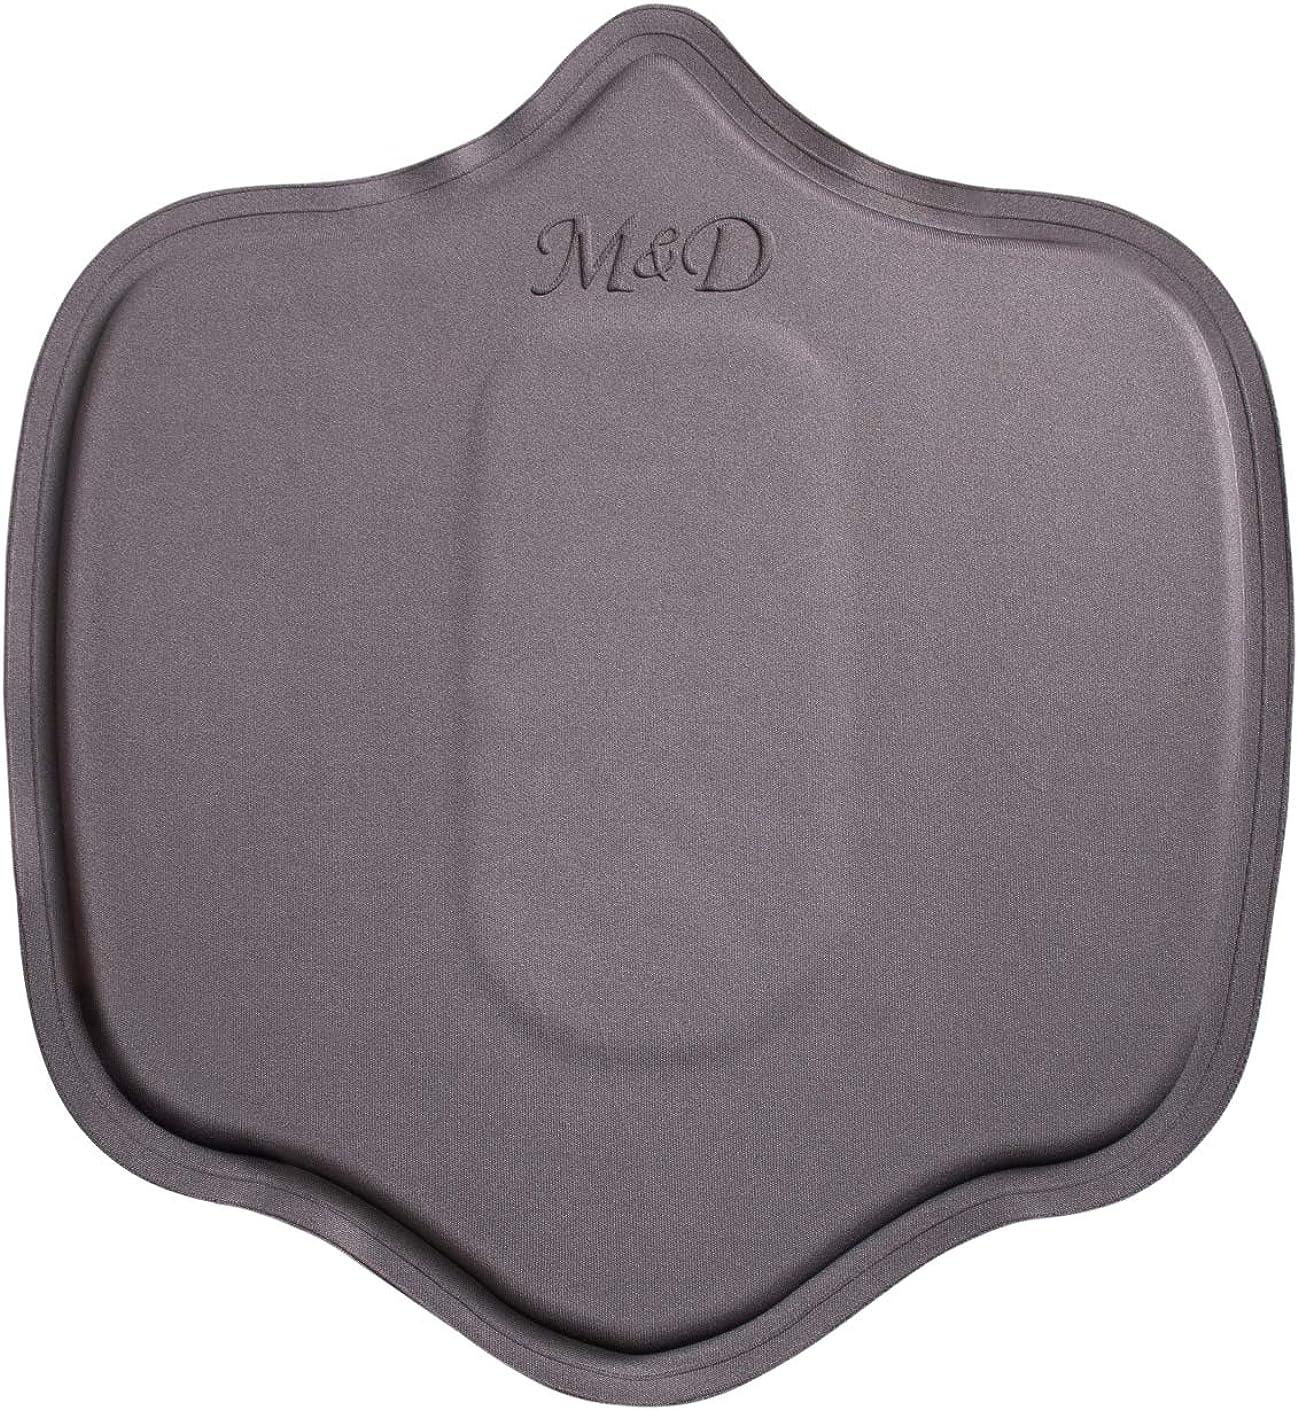 M&D 0105 Compression Flattening Ab Lipo Board Post Surgery Foam After Tummy Tuck Tabla Abdominal Moldeadora Gray